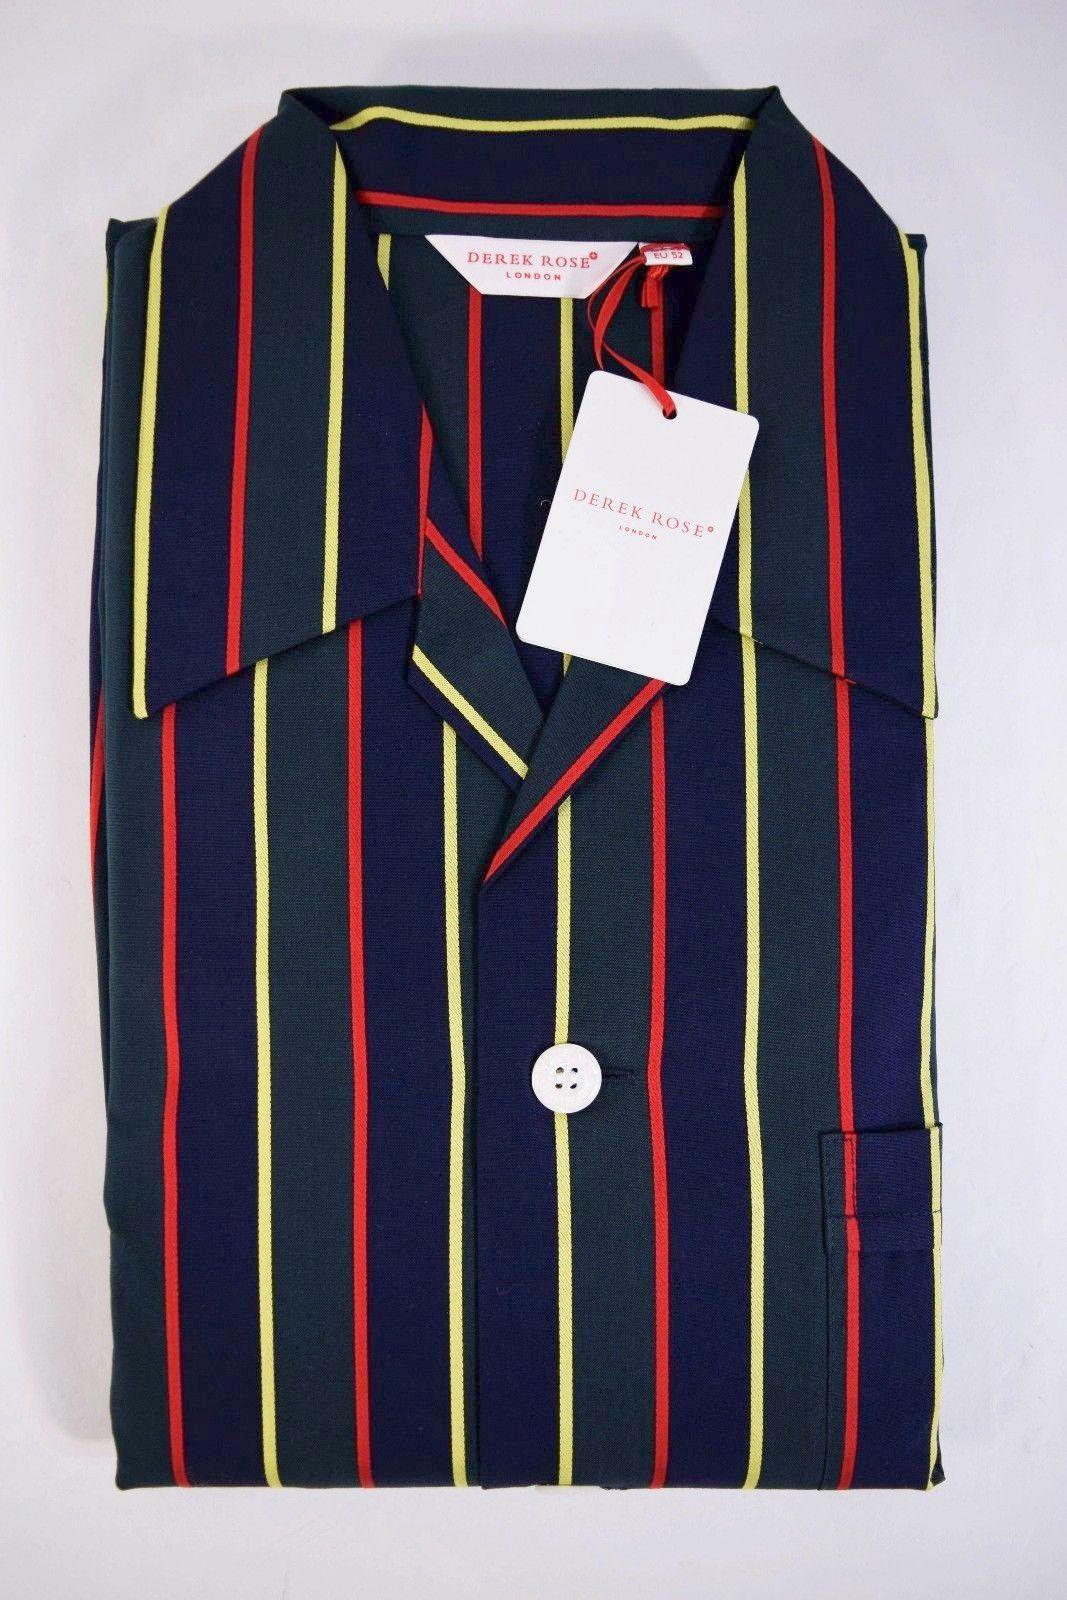 DEREK ROSE pigiama uomo lungo APERTO 100/% cotone raso POIS blu tg M-L-XL-XXL